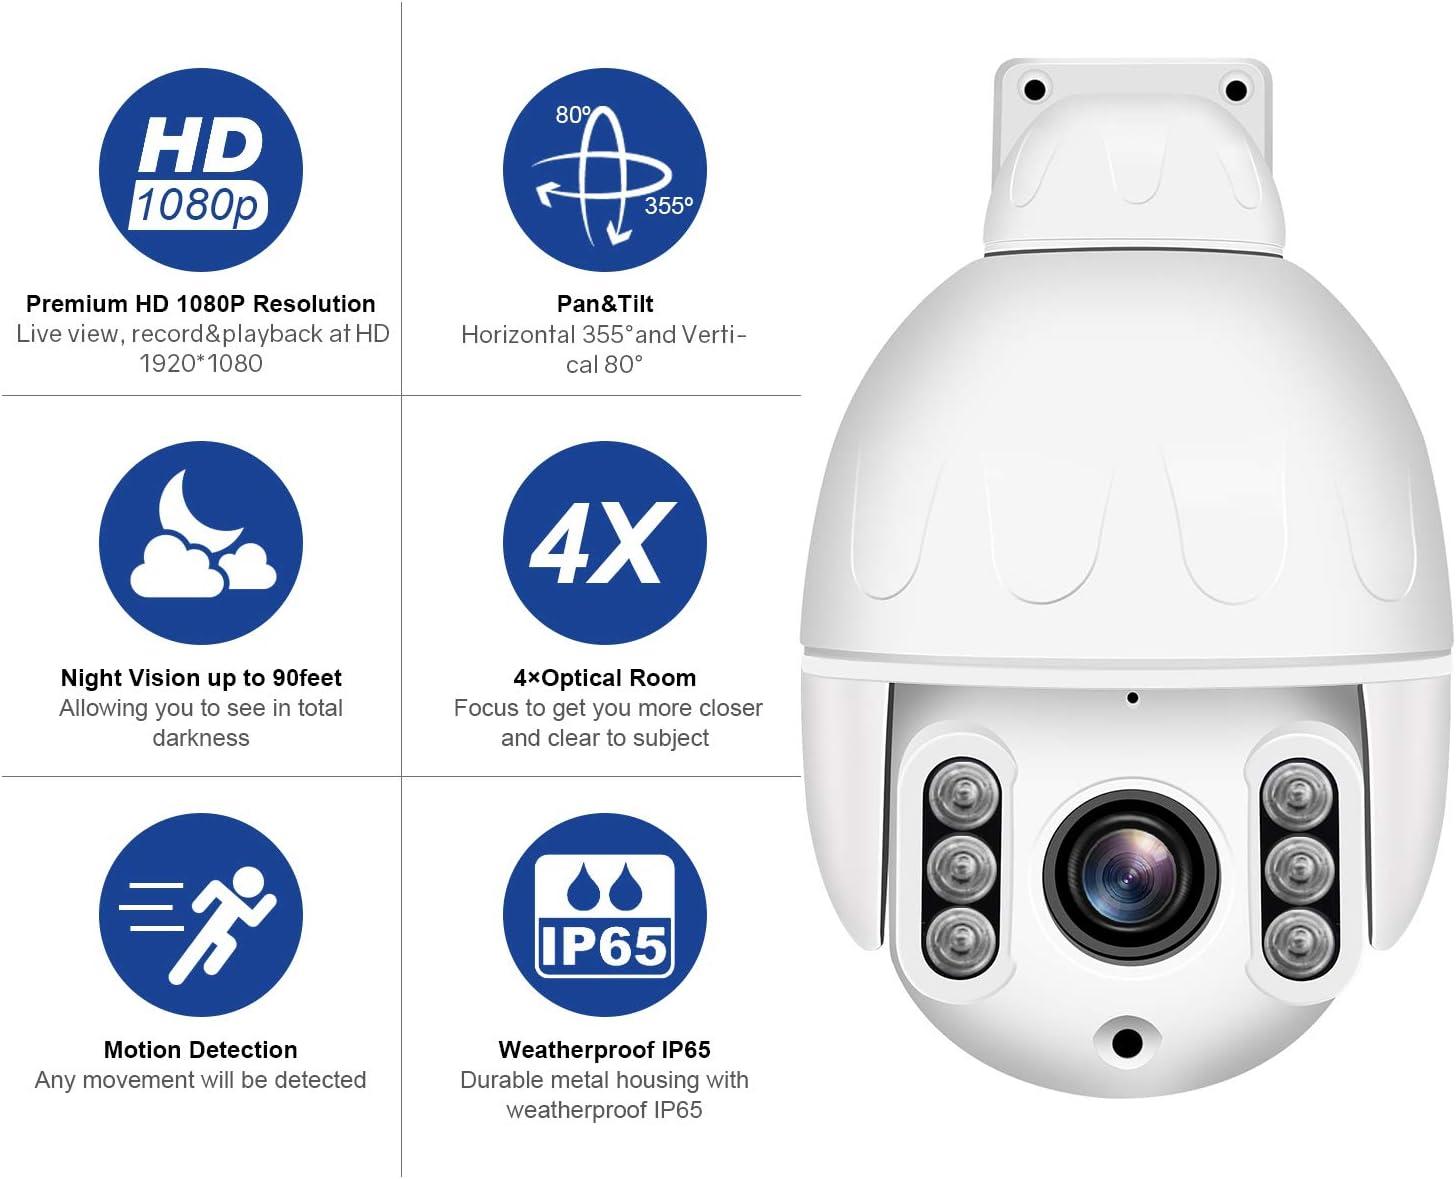 Ranura para Tarjeta SD Externa C/ámara de Seguridad WiFi para Exteriores Dericam Mini 1080P /ángulo de visi/ón de 90/° Enfoque autom/ático S2C,Negro visi/ón Nocturna de 30m 4X PTZ /óptico